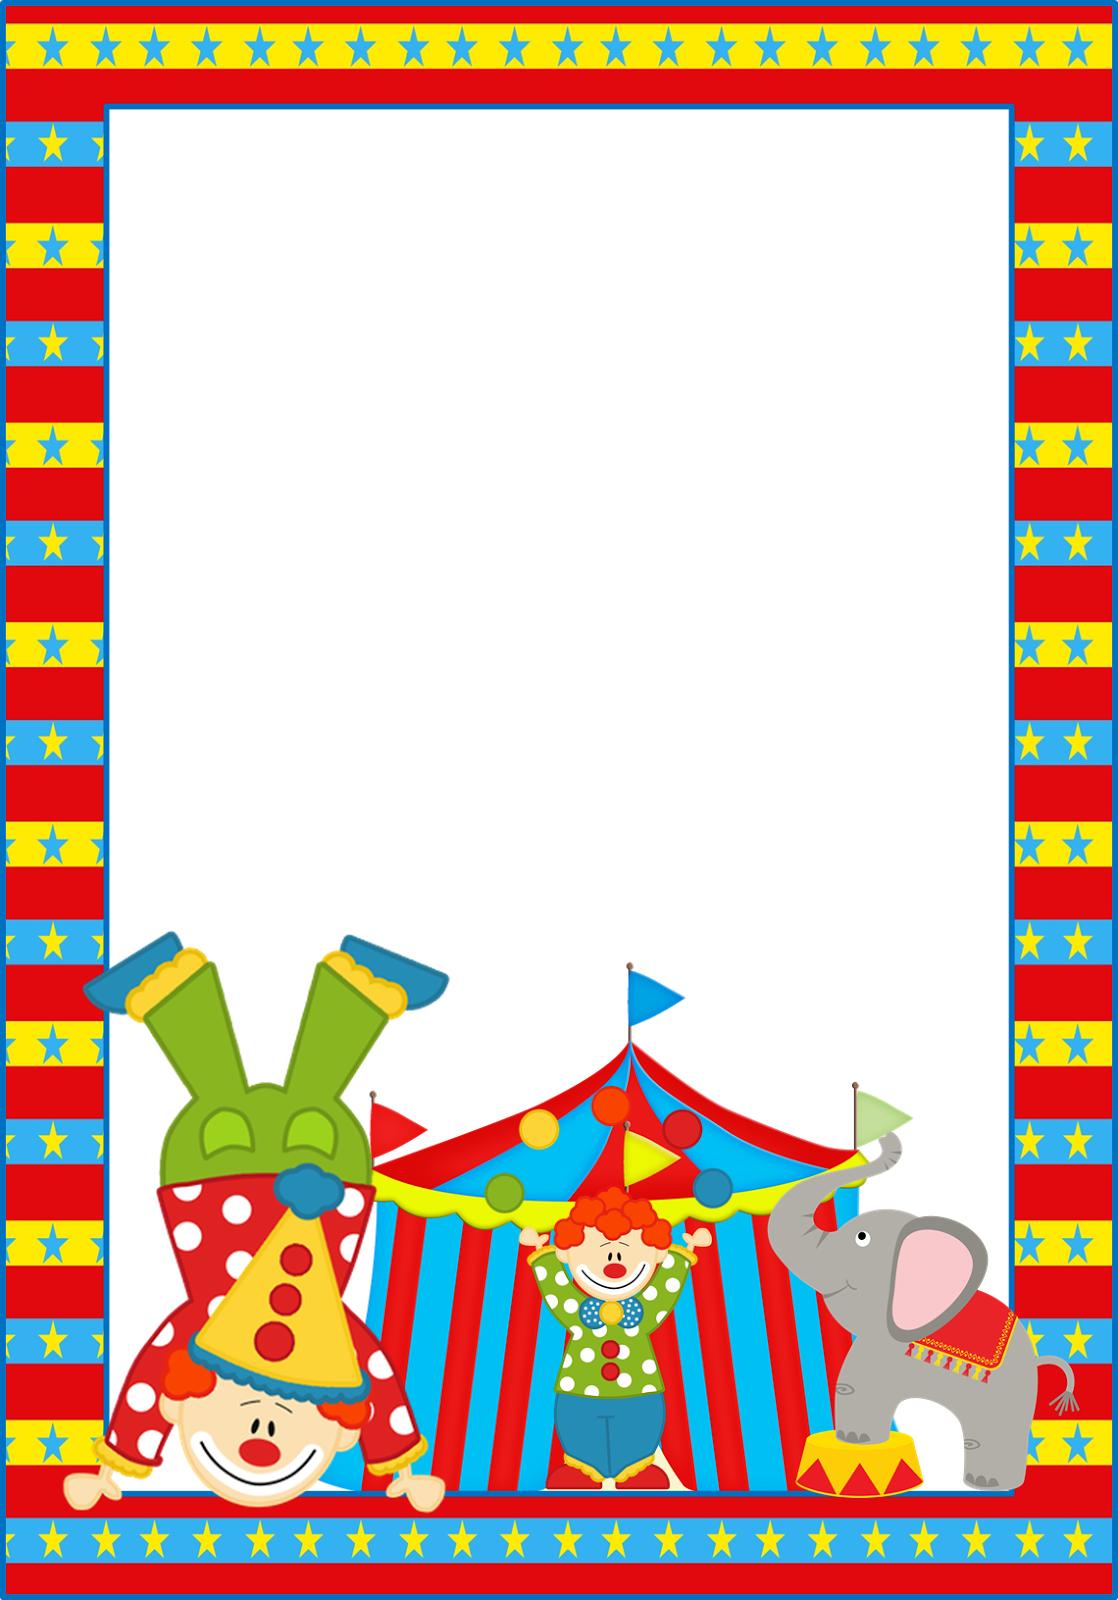 Pin by joy tschiniak on CIRCUS CITY | Pinterest | Circus party ...